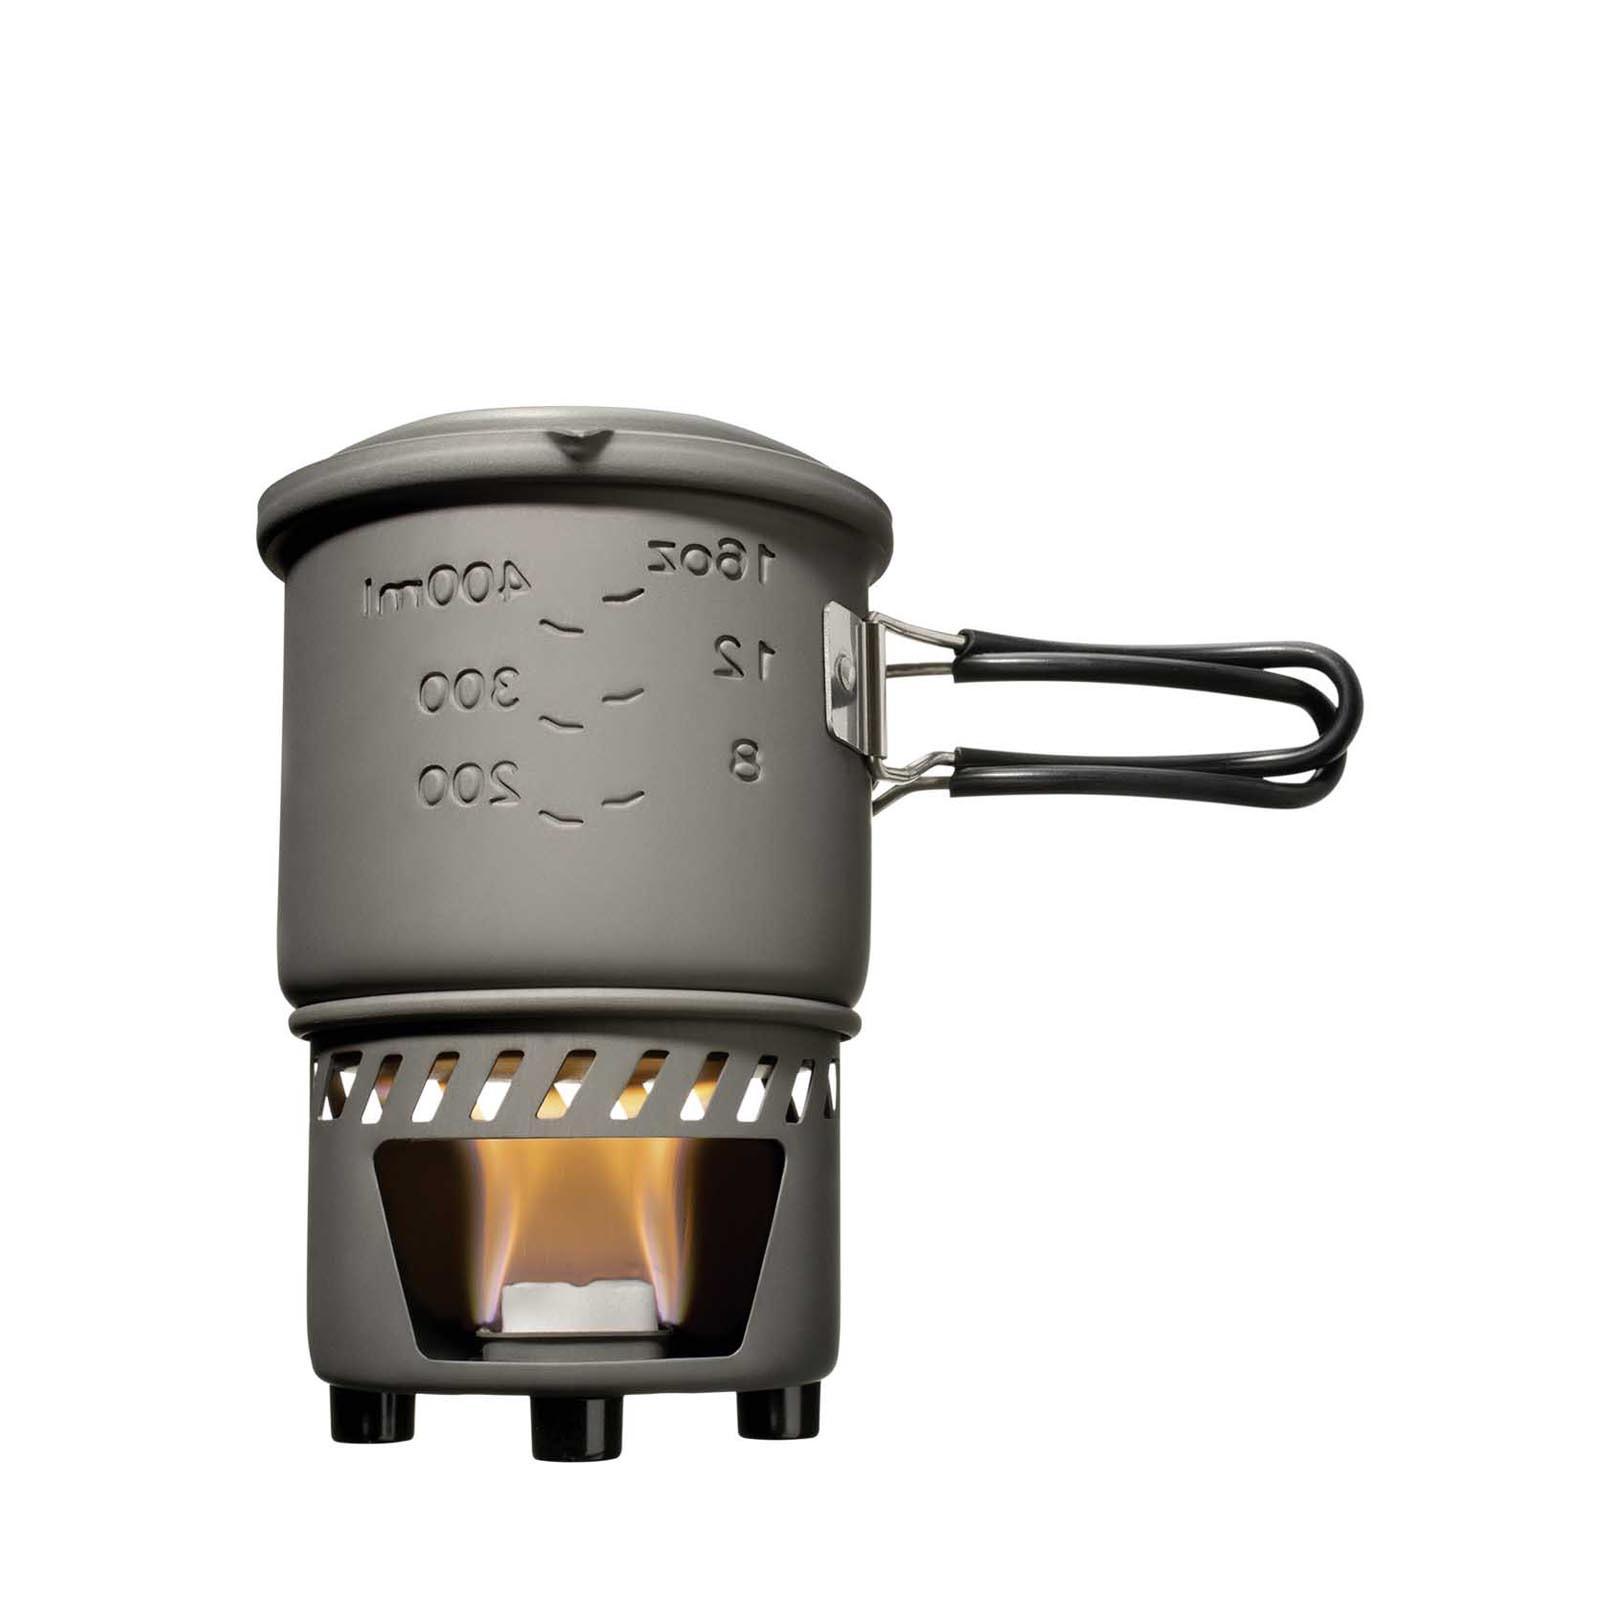 Esbit - 585 ml cookset